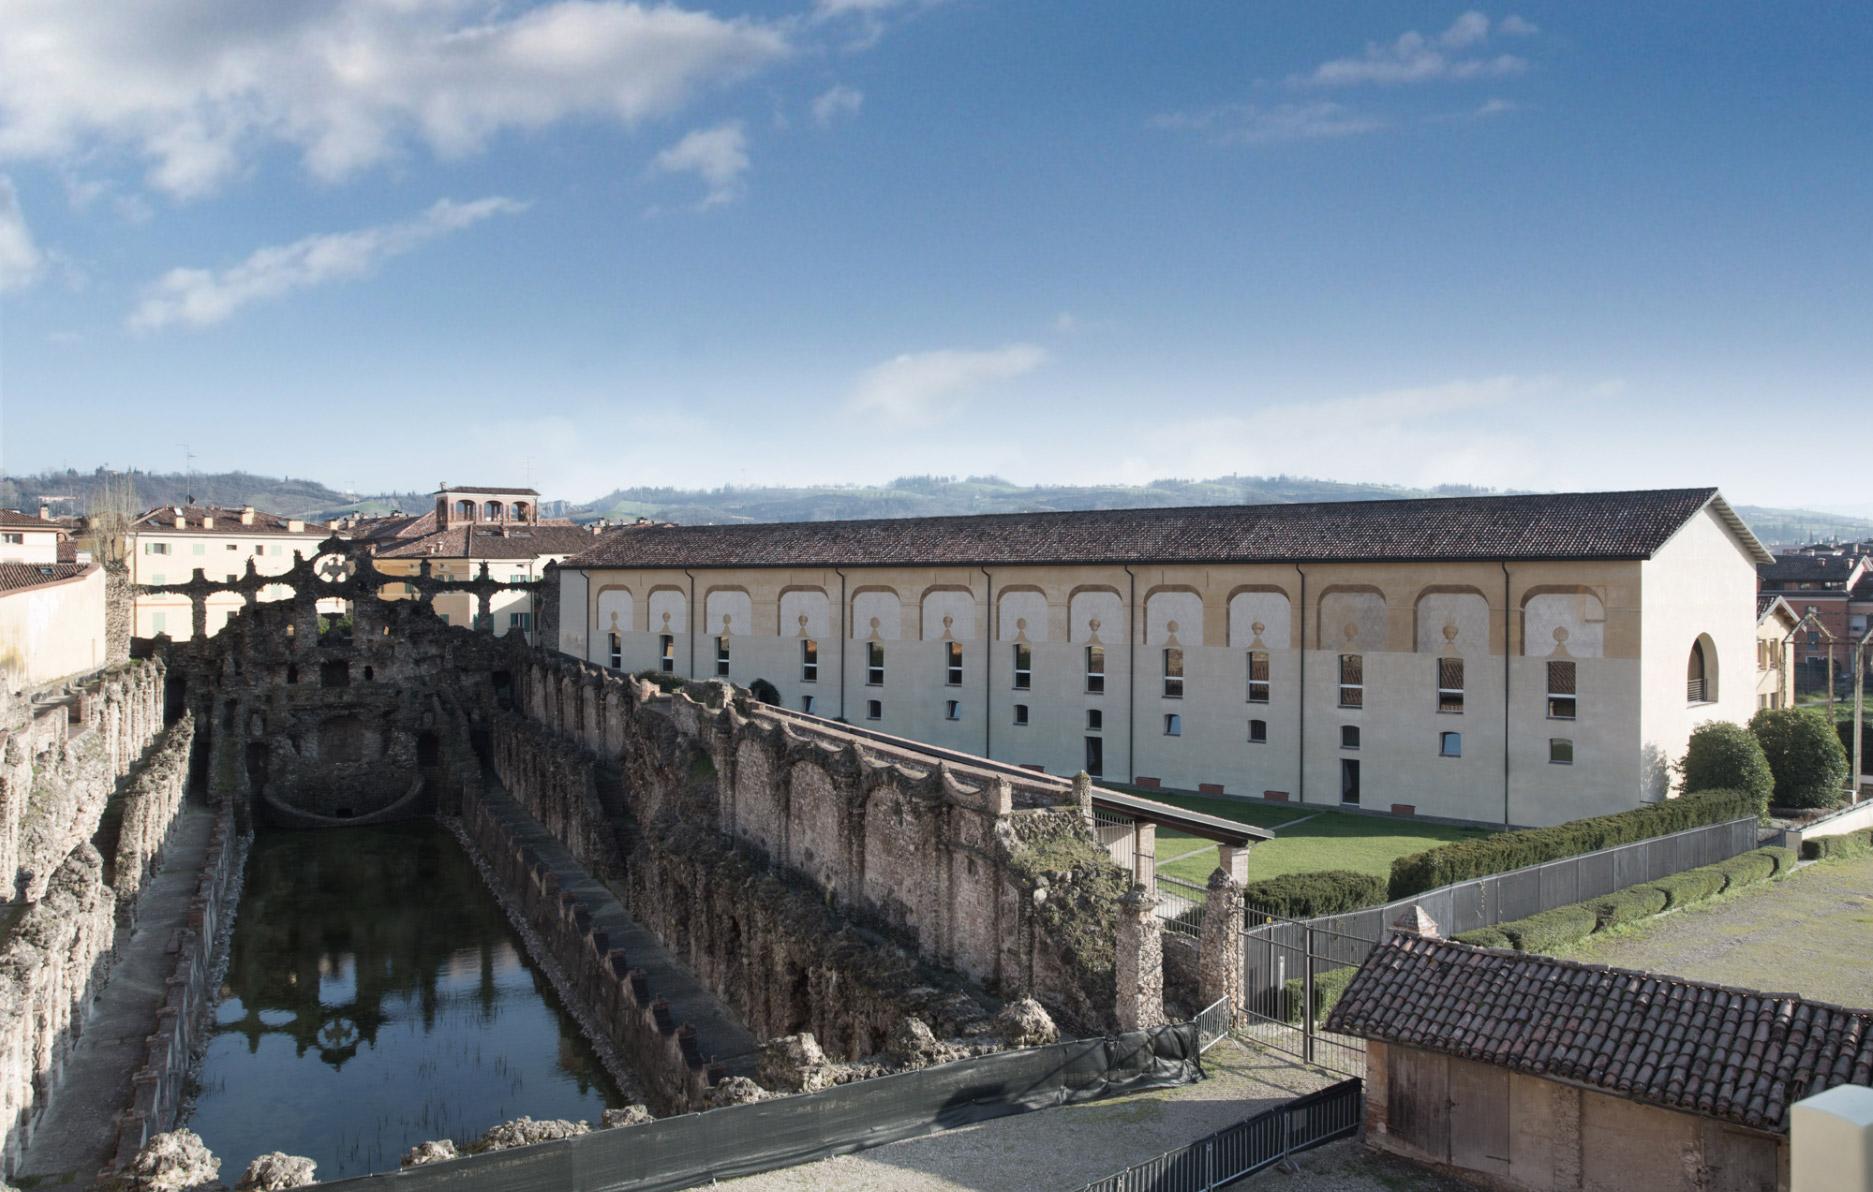 Bertozzi & Casoni Museum Sassuolo